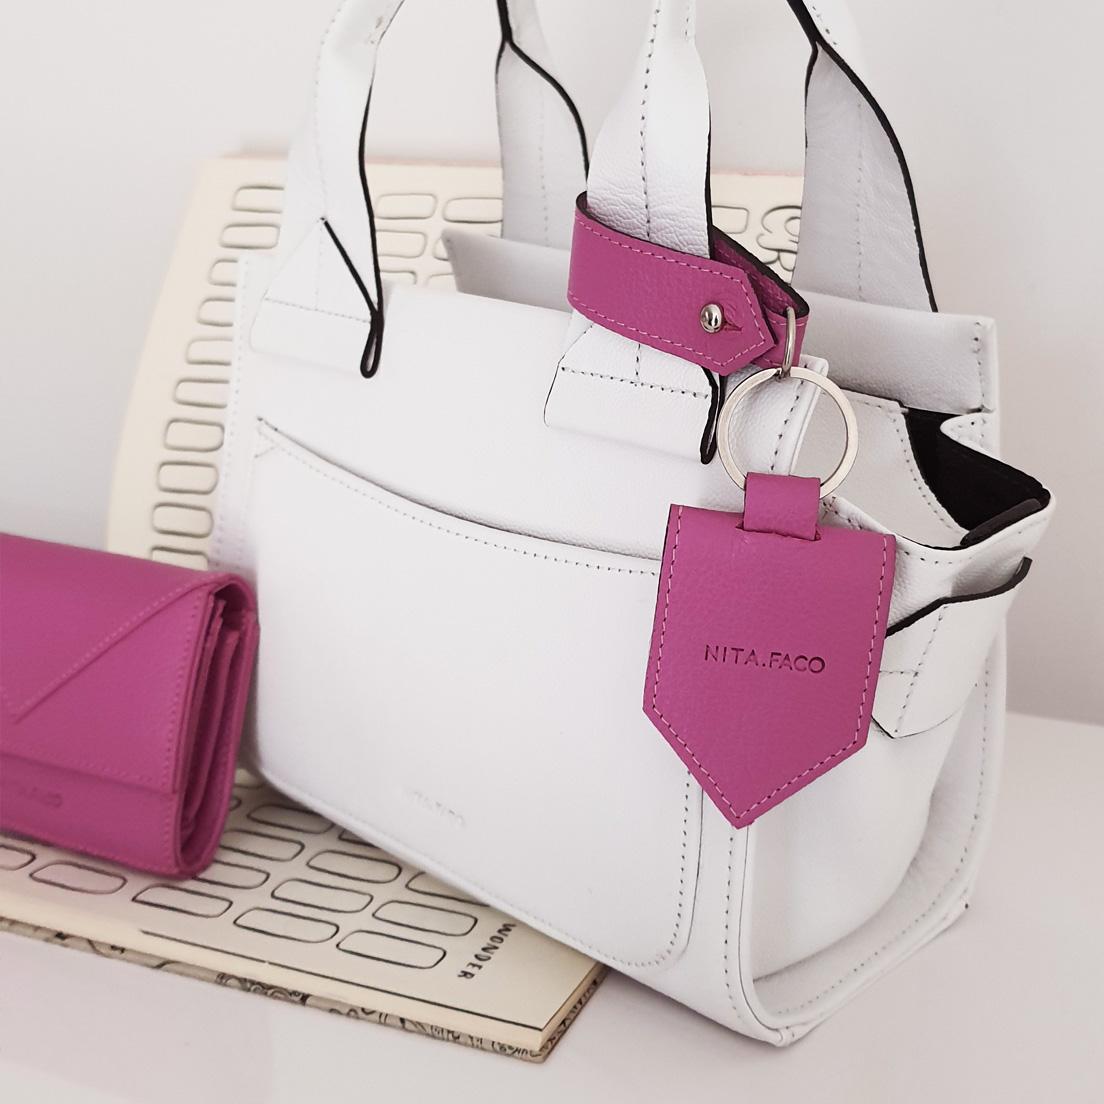 Chaveiro de Couro Relicário Pink